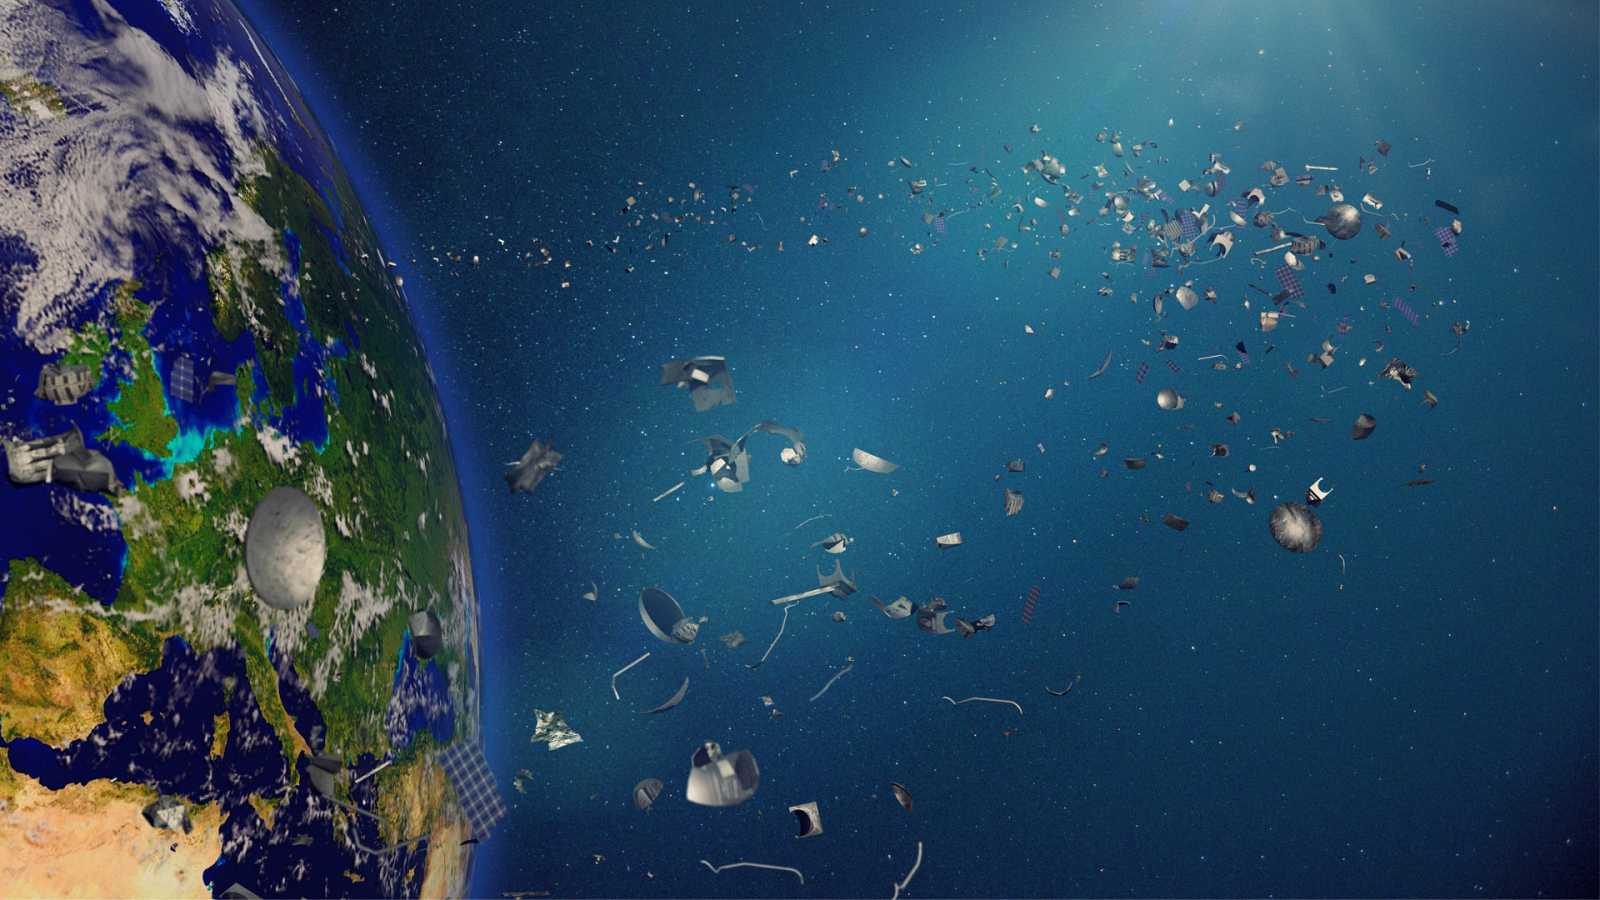 A golpe de bit - España lidera un proyecto para eliminar la basura espacial - 25/11/19 - escuchar ahora